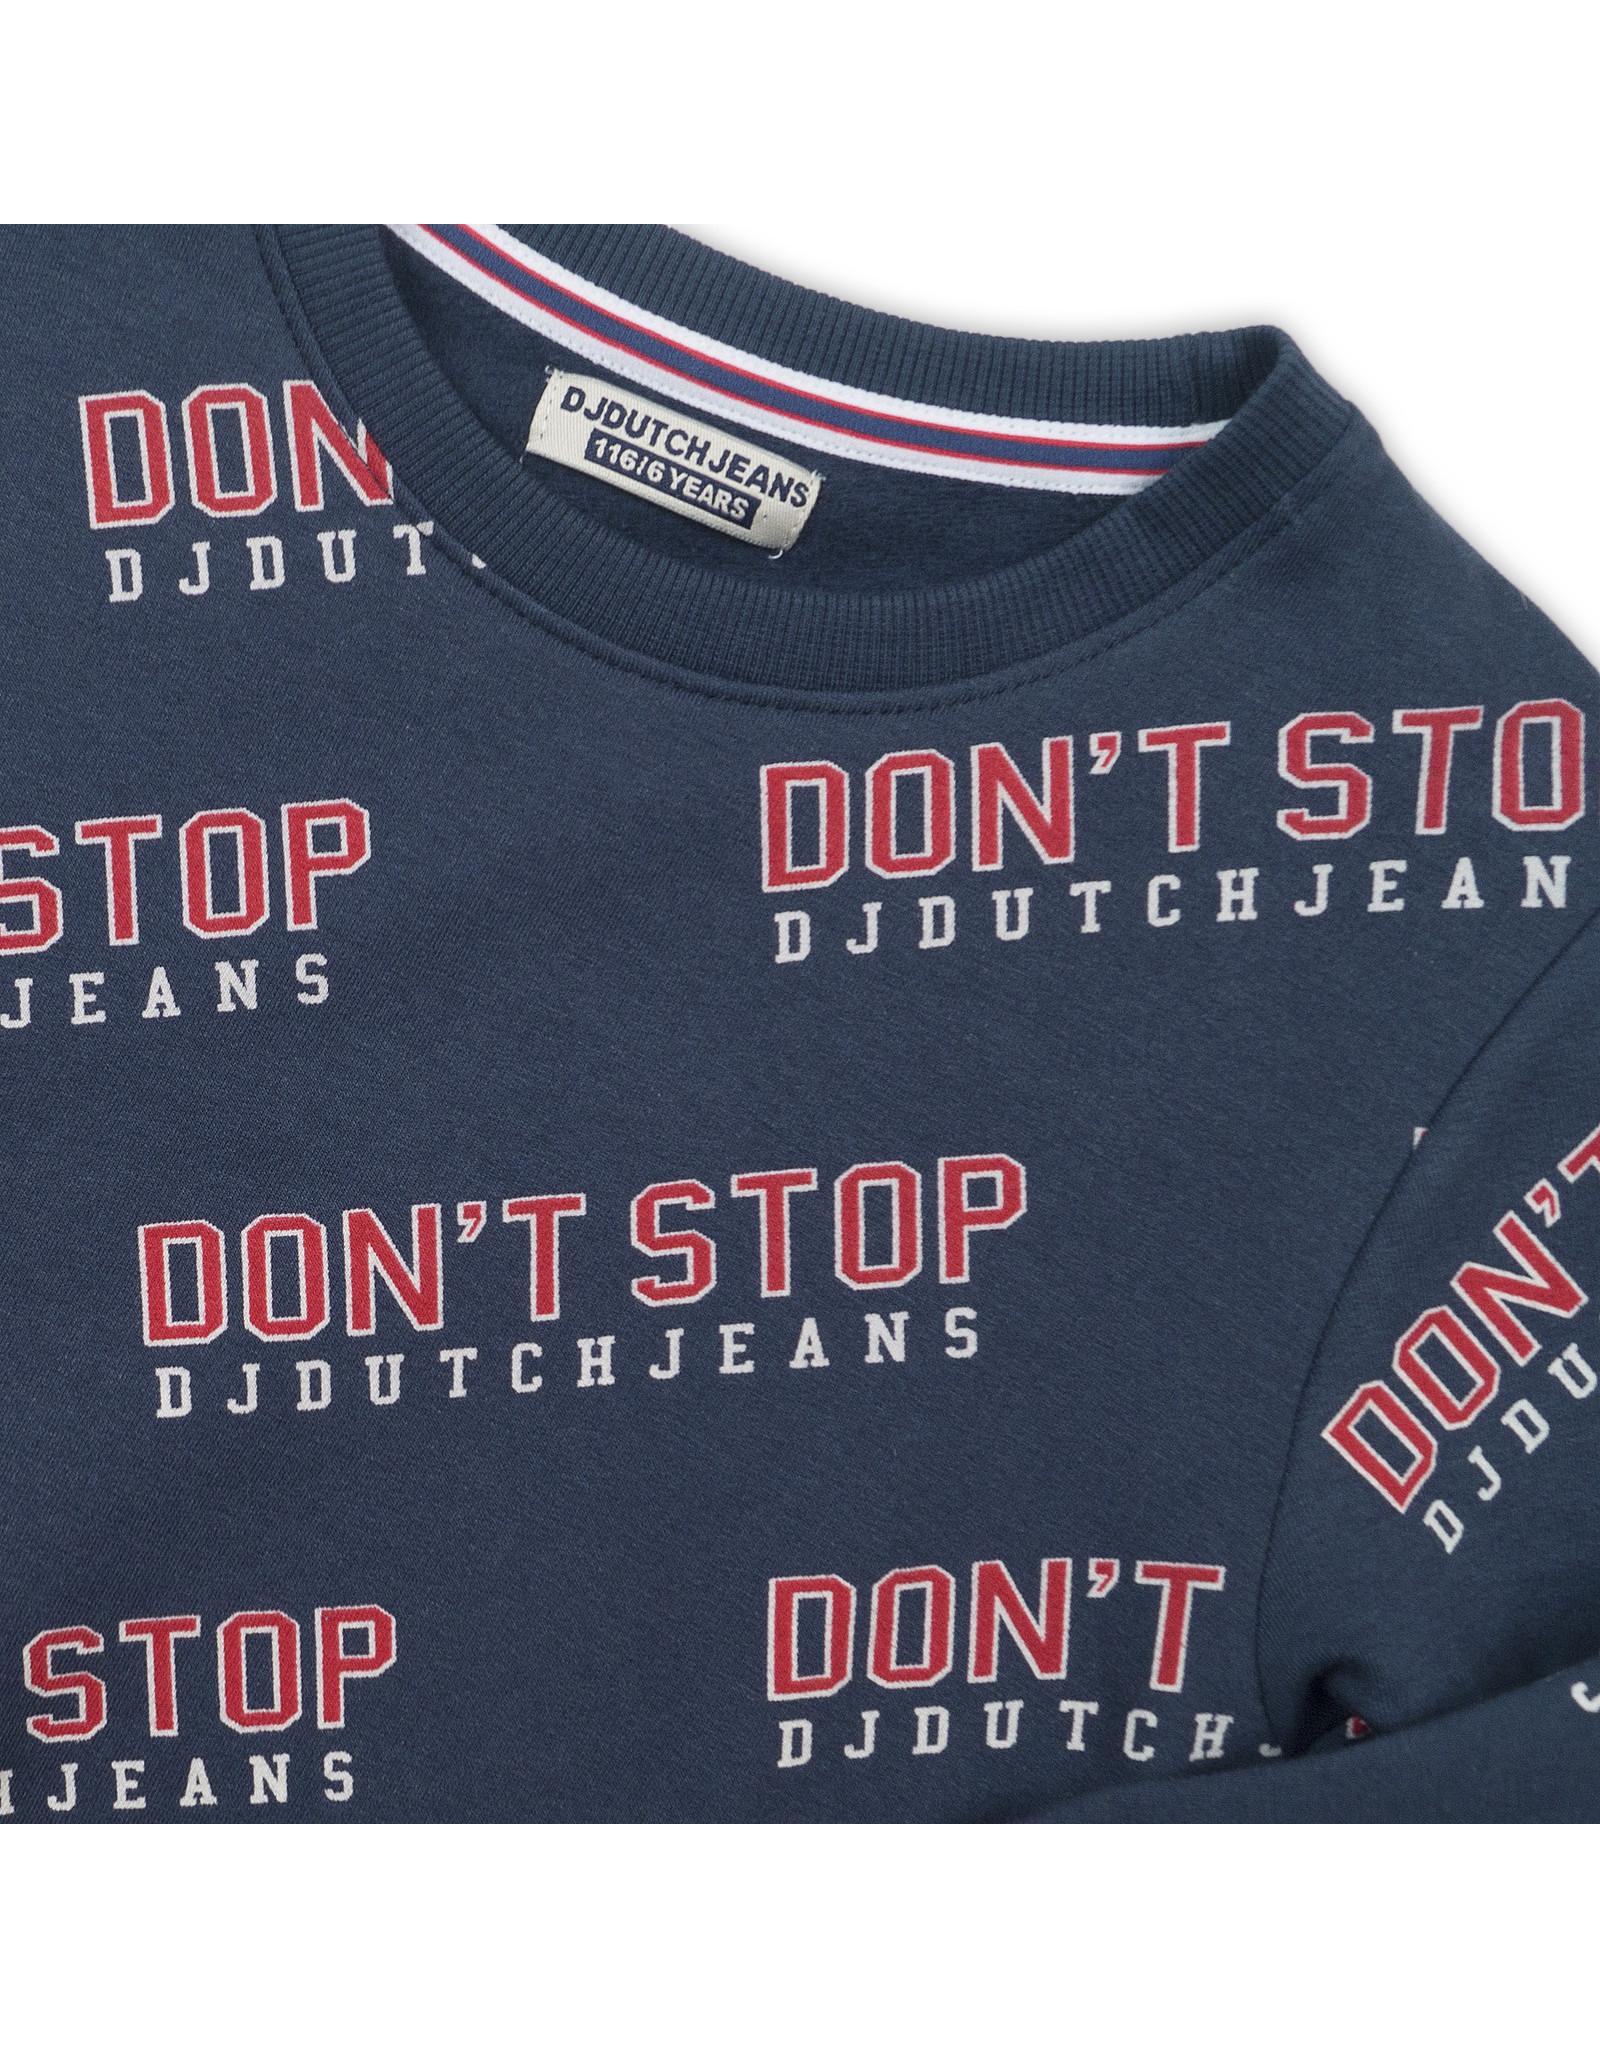 Dutch Jeans Sweaters, Navy